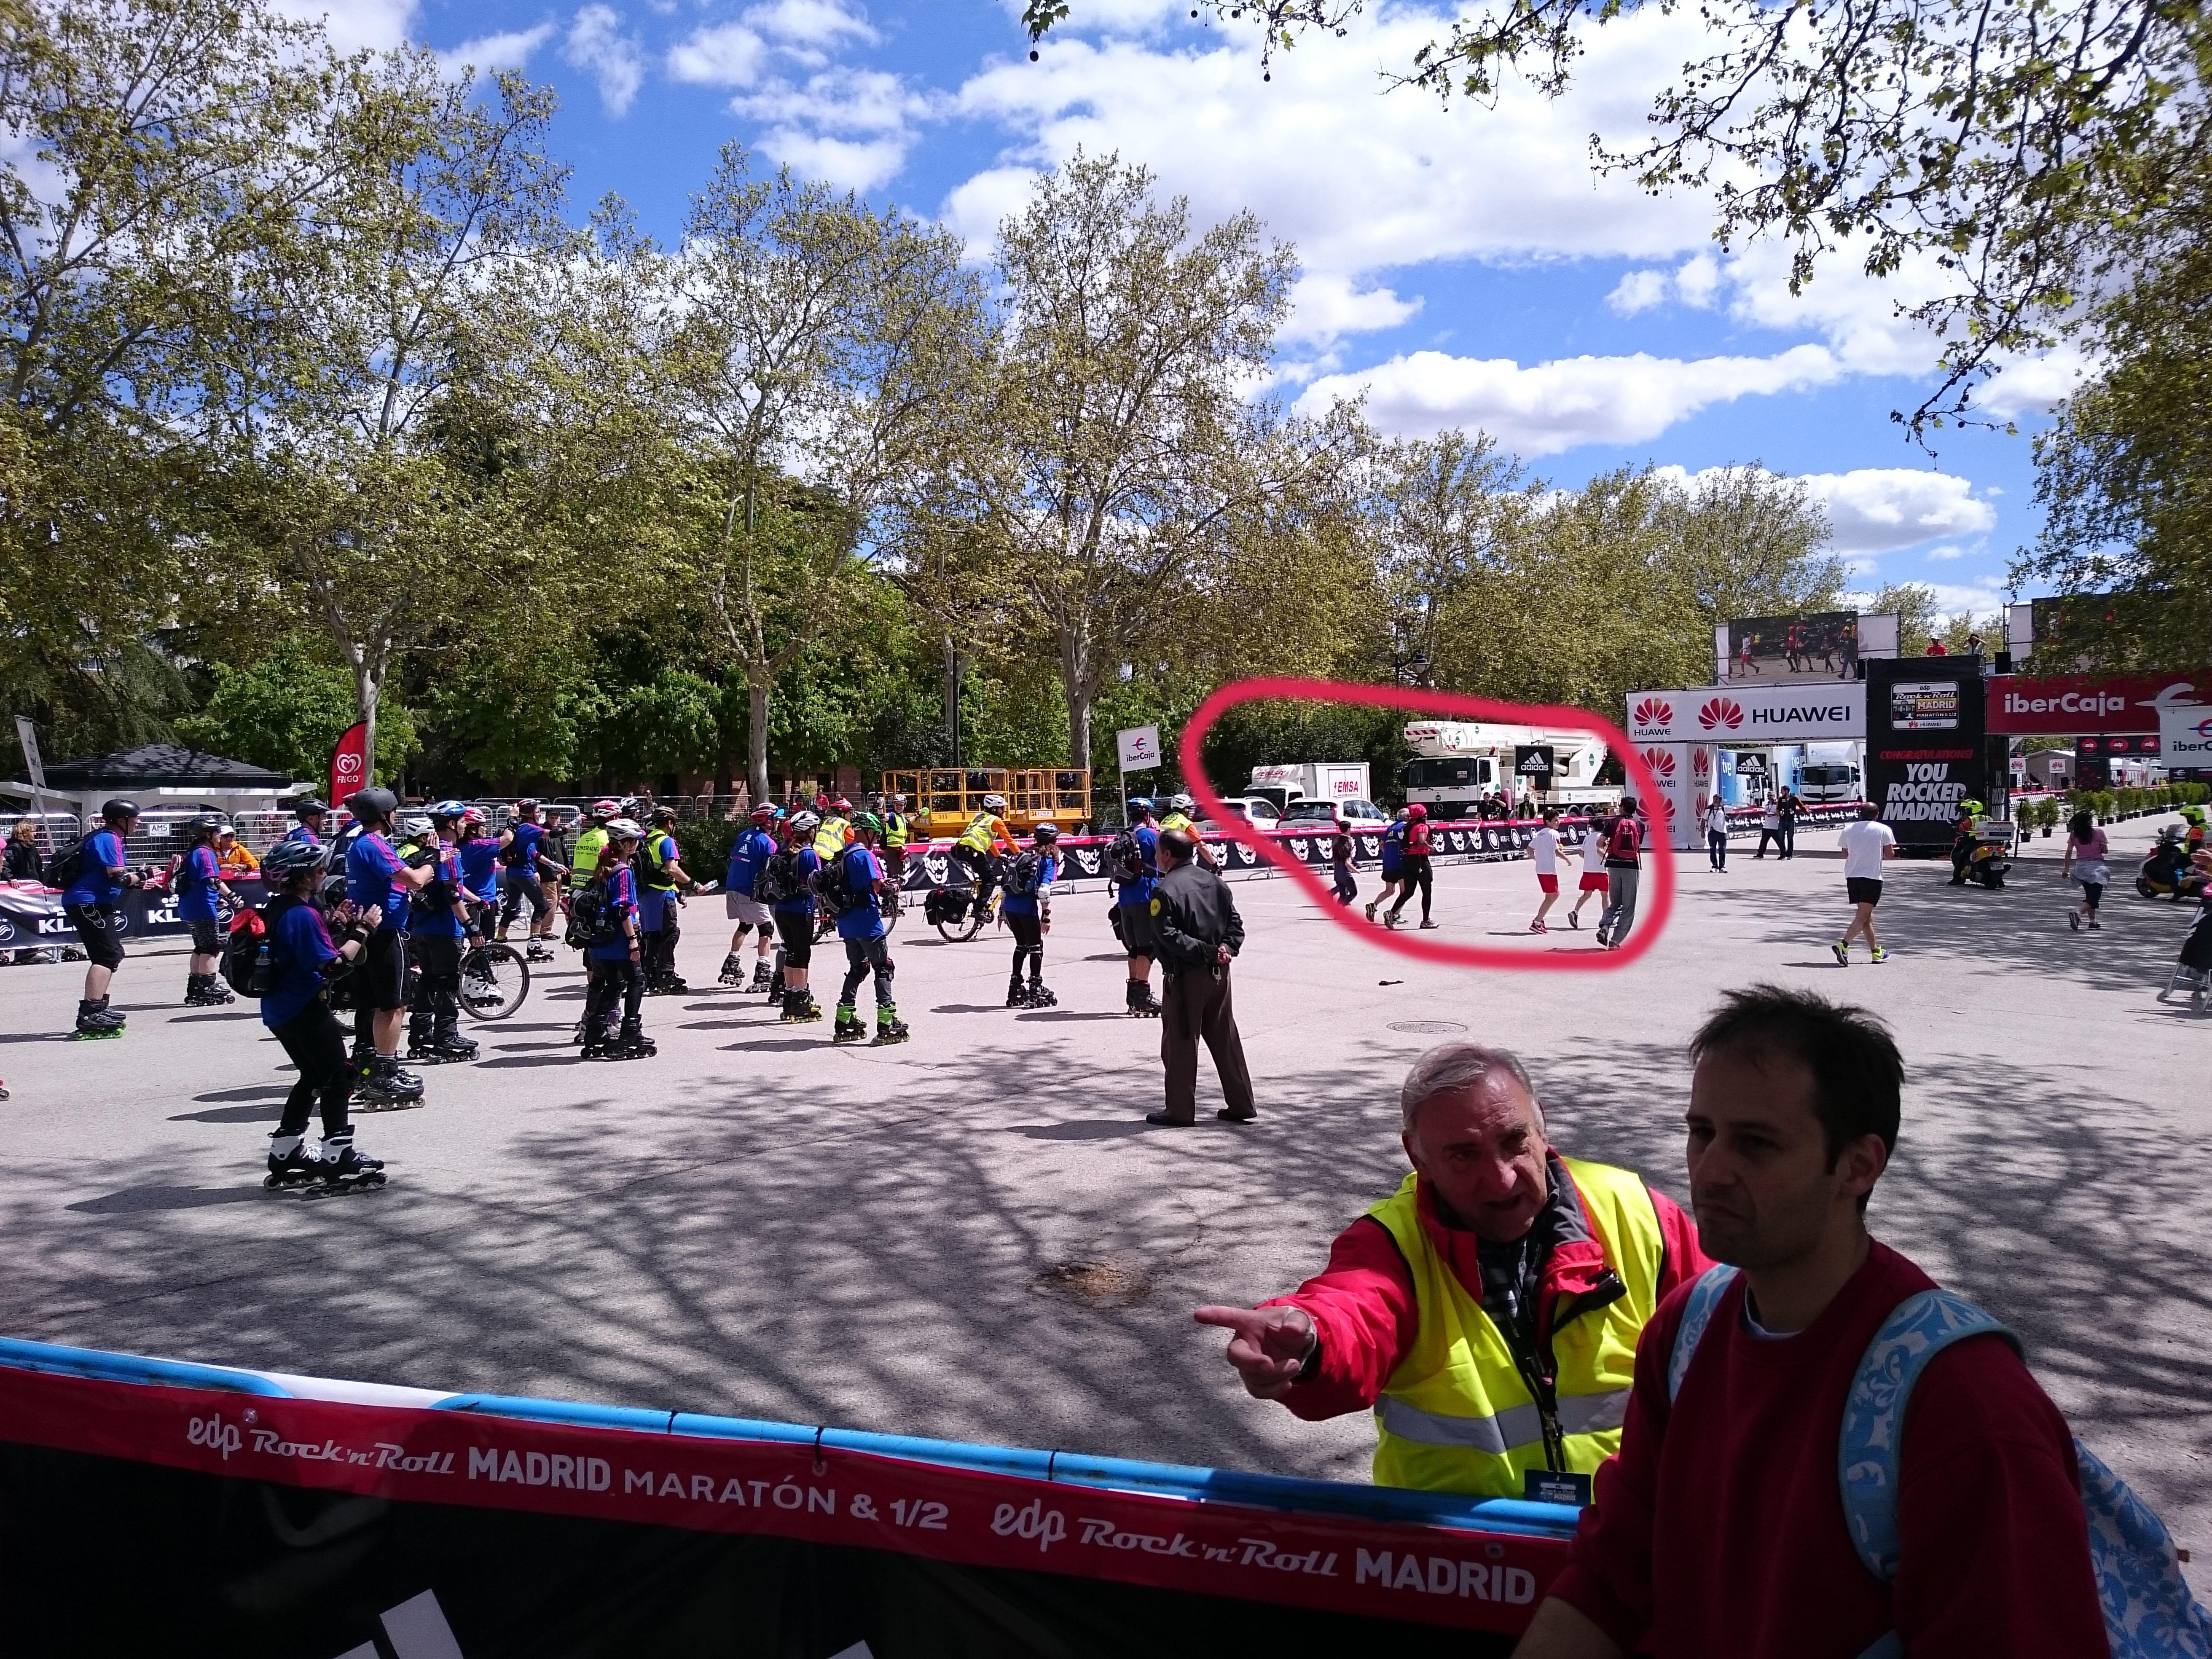 закрытие трассы марафона